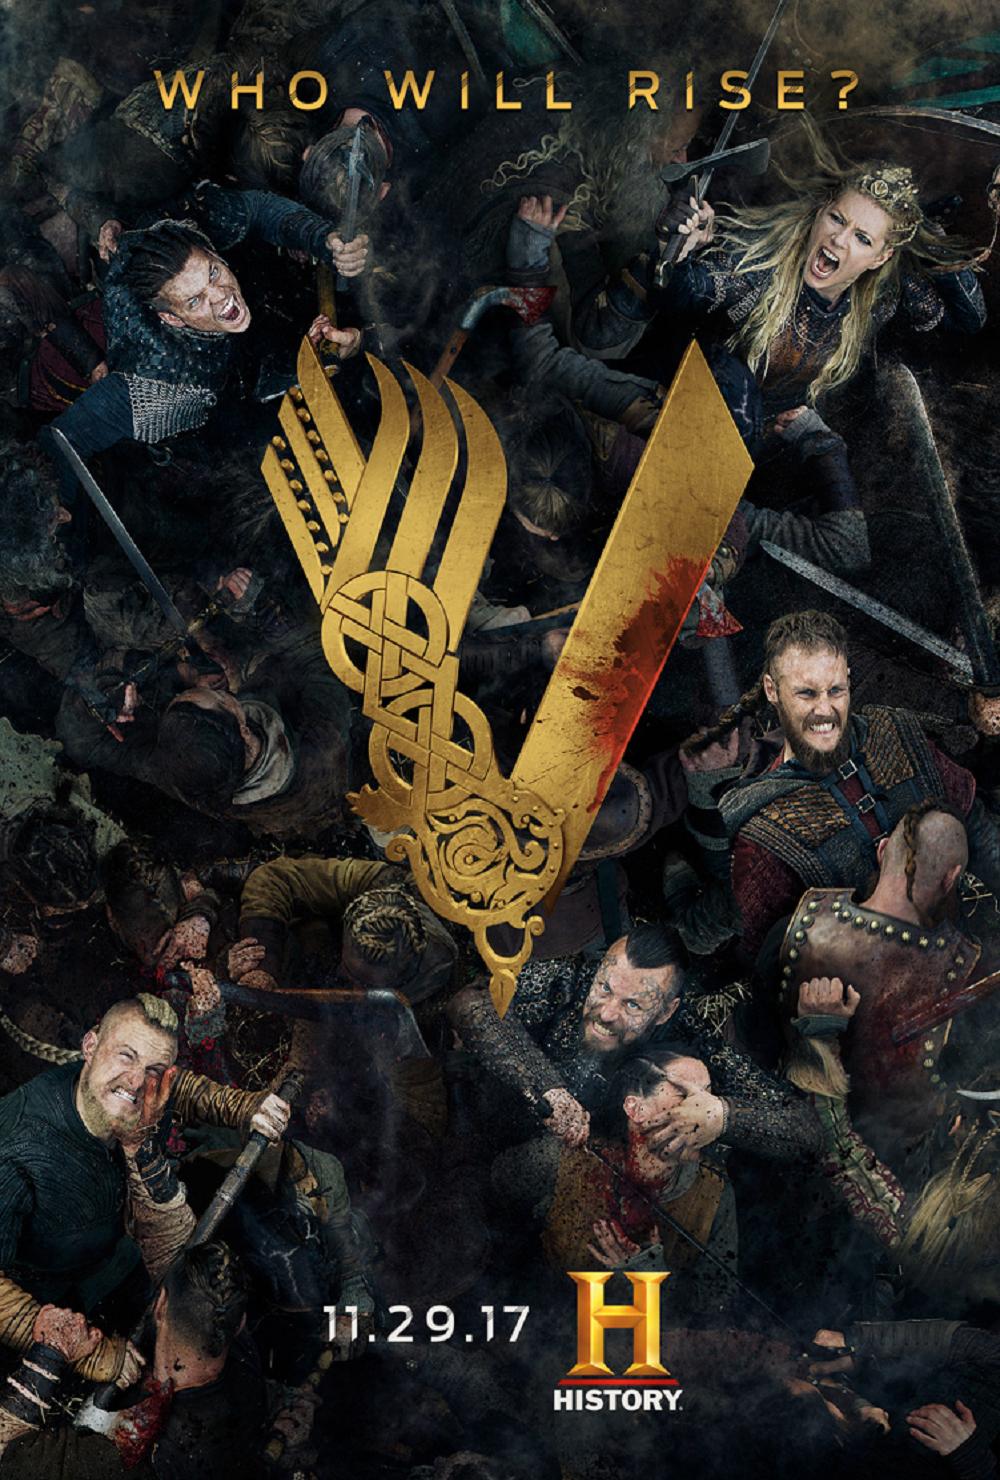 Vikings S05E04 HD 720p – 480p [English]